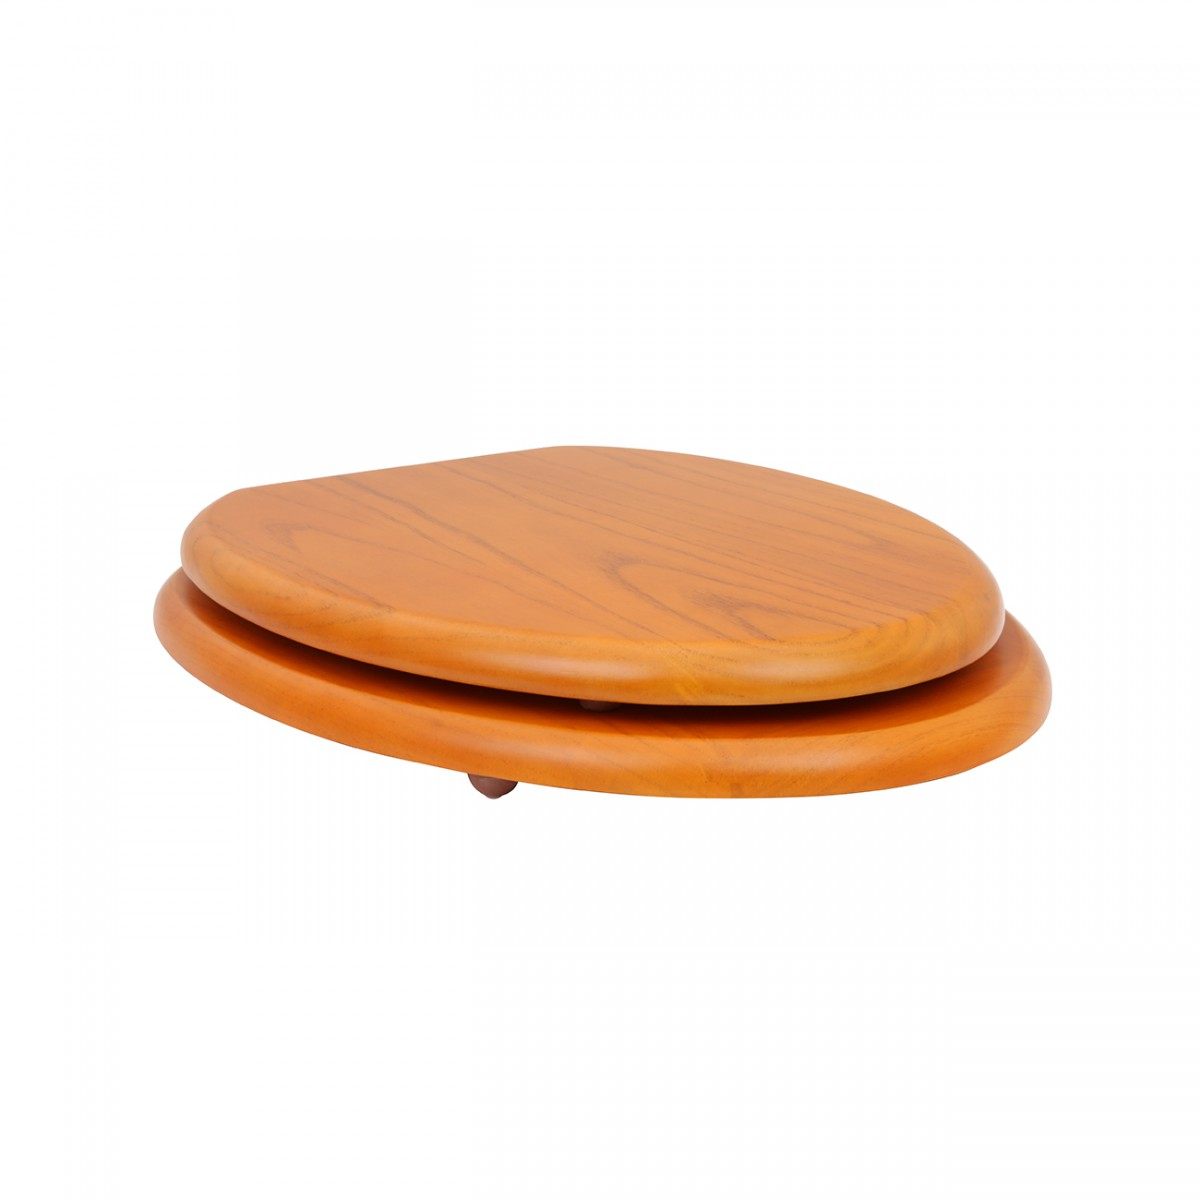 Elongated Toilet Seat Solid Wood Golden Oak Brass PVD Hinge wooden toilet seats elongated toilet seat elongated toilet seats